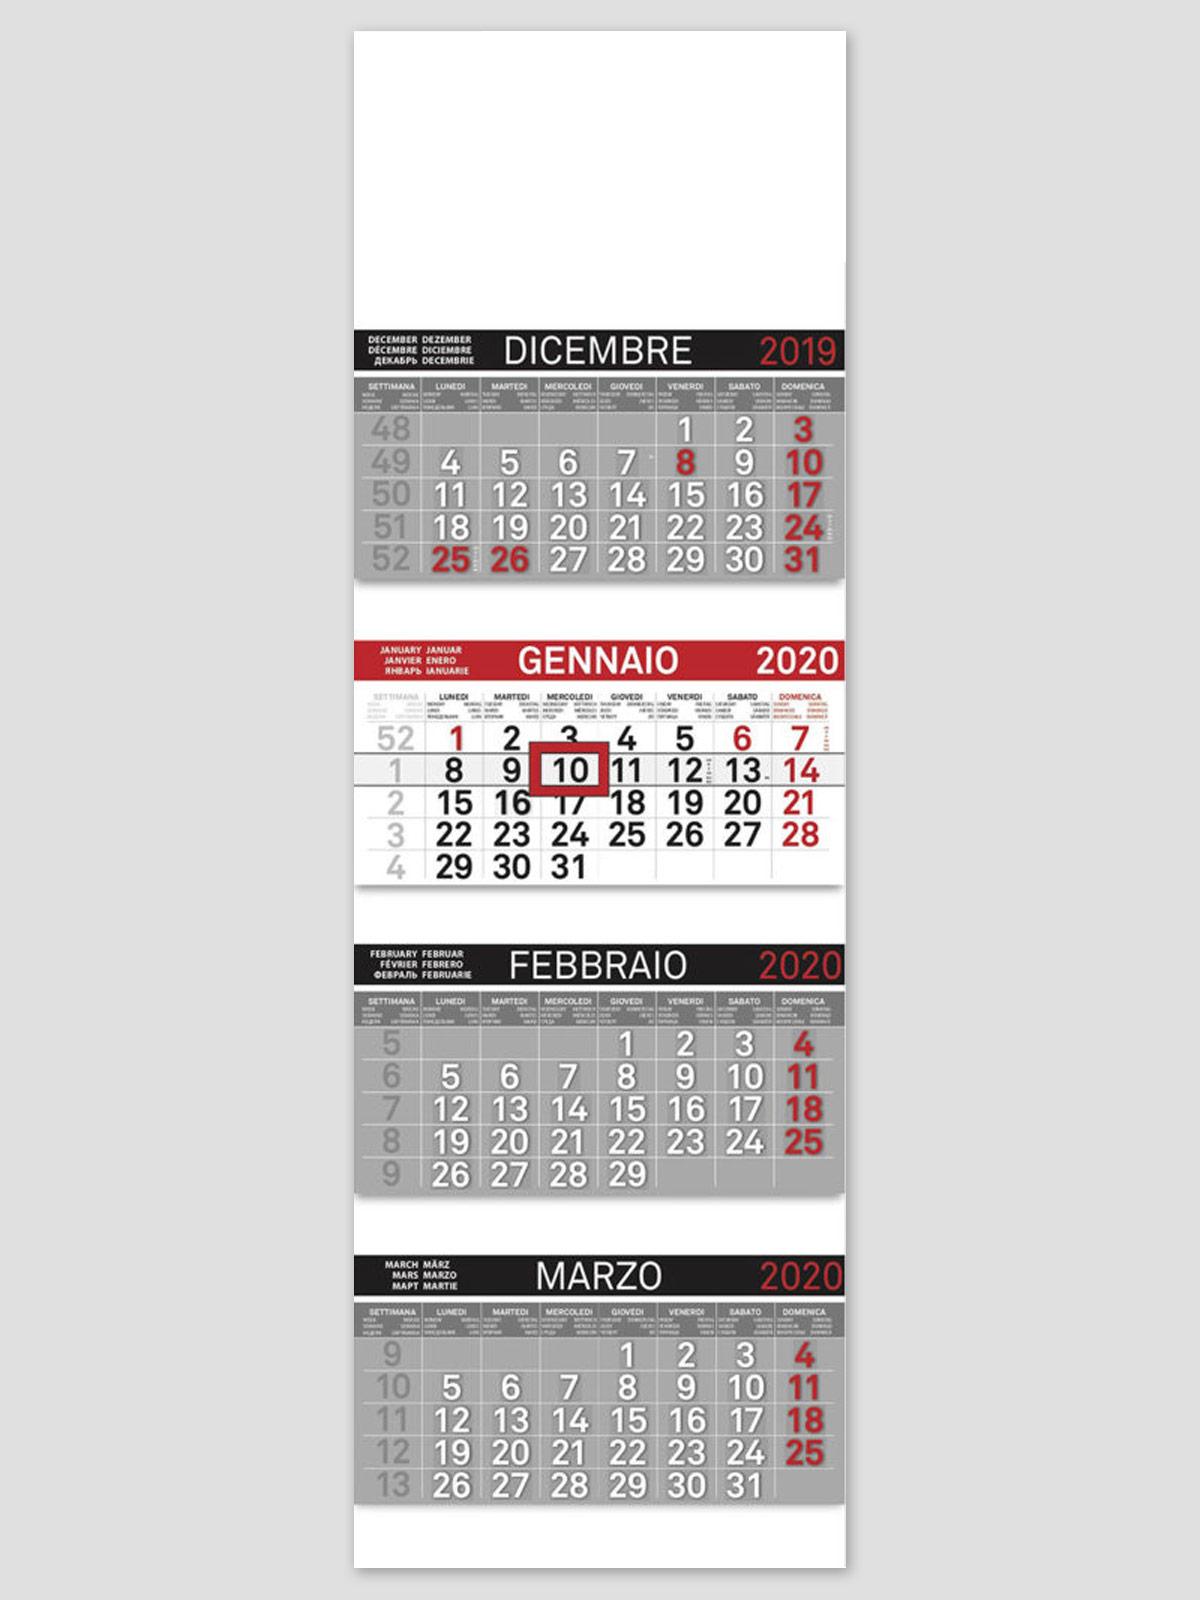 Calendario Parete.Calendario Da Parete Quadrico Art 807 Cm 32x100